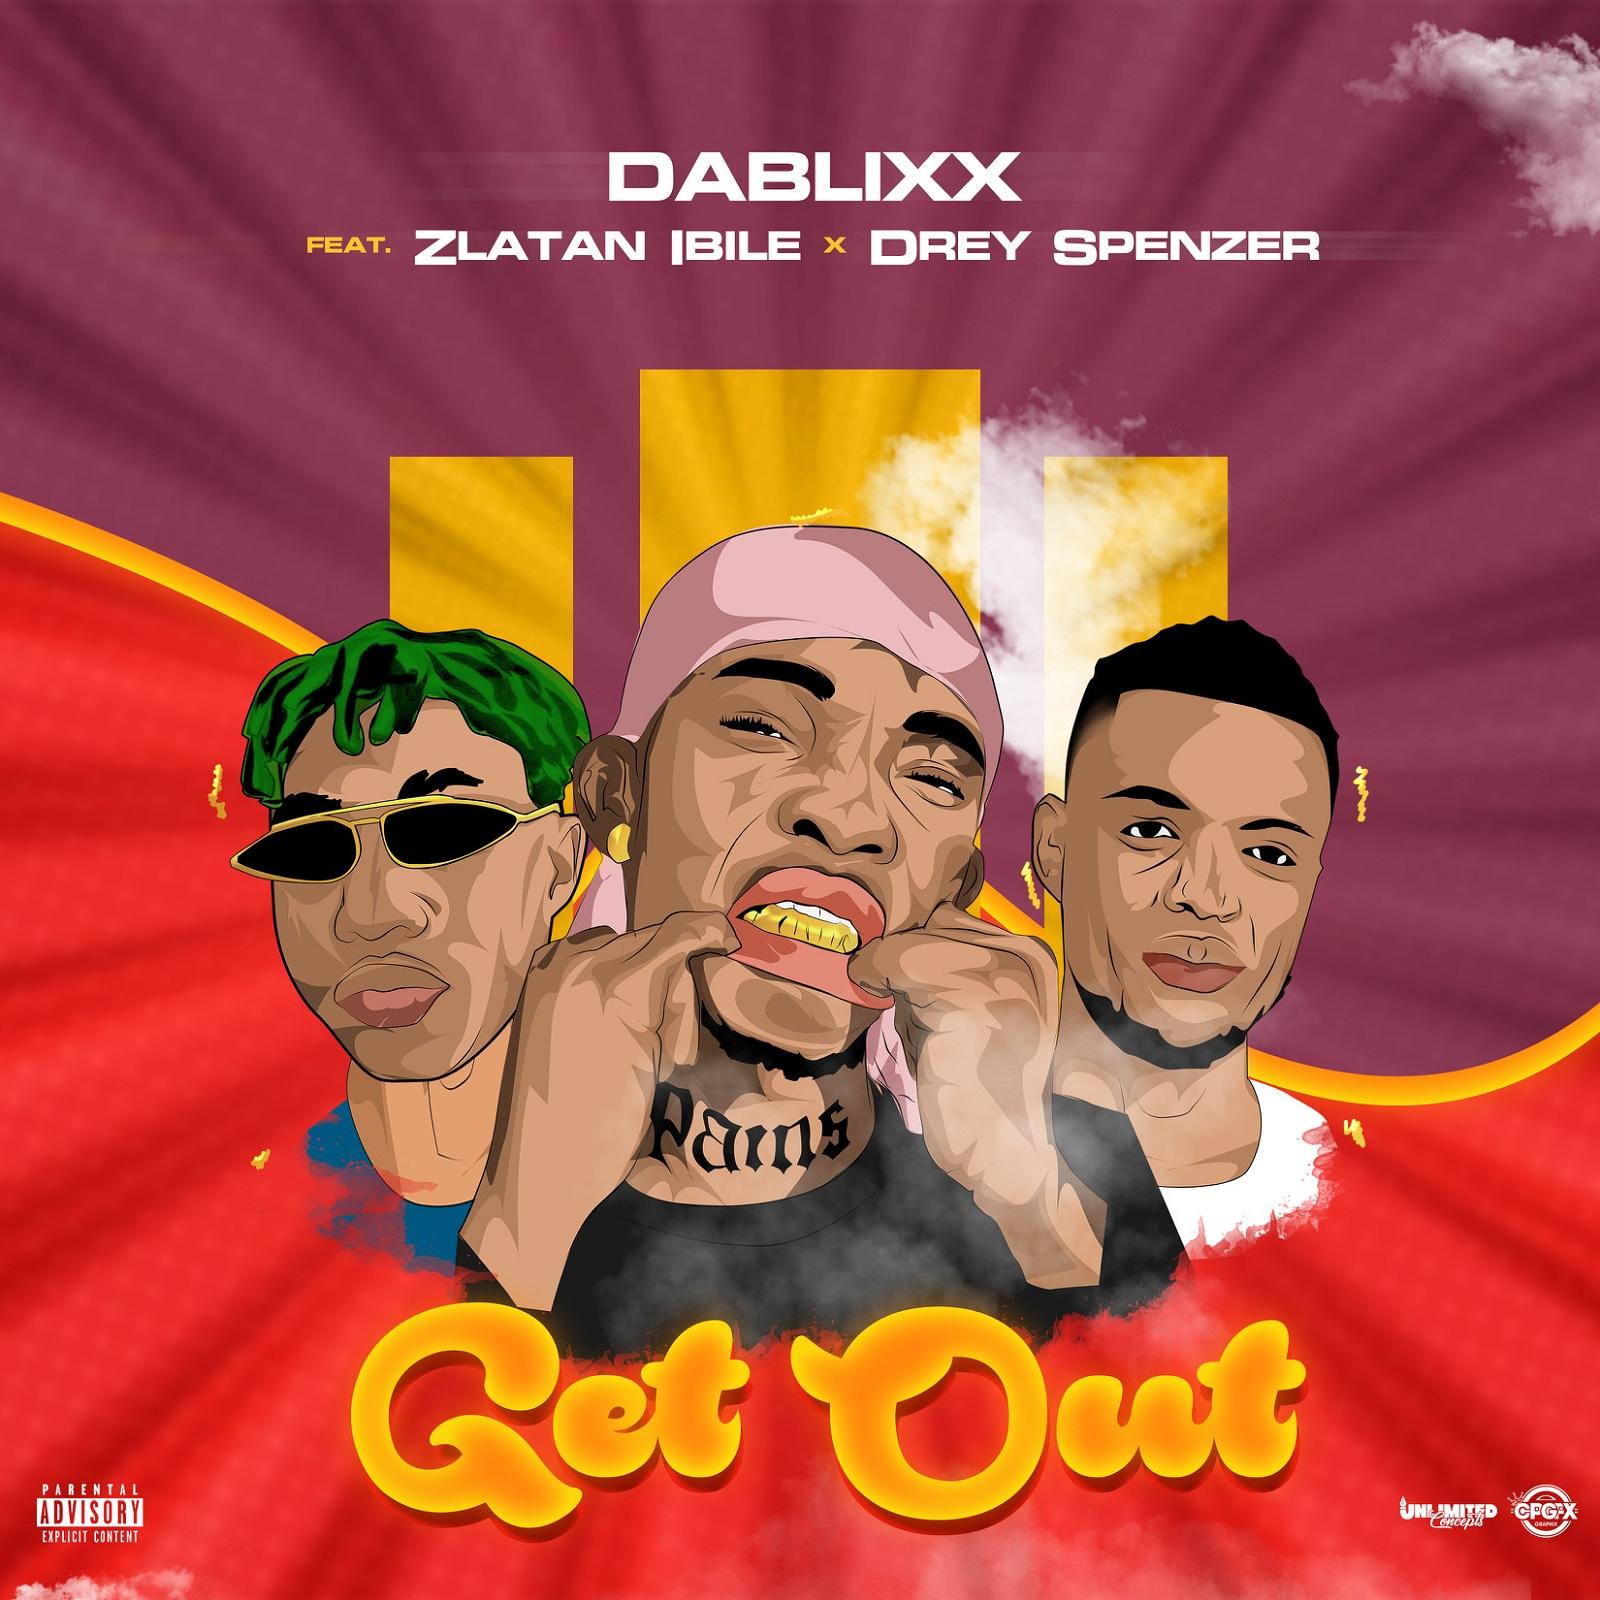 Dablixx ft. Zlatan Ibile & Drey Spenzer - Get Out